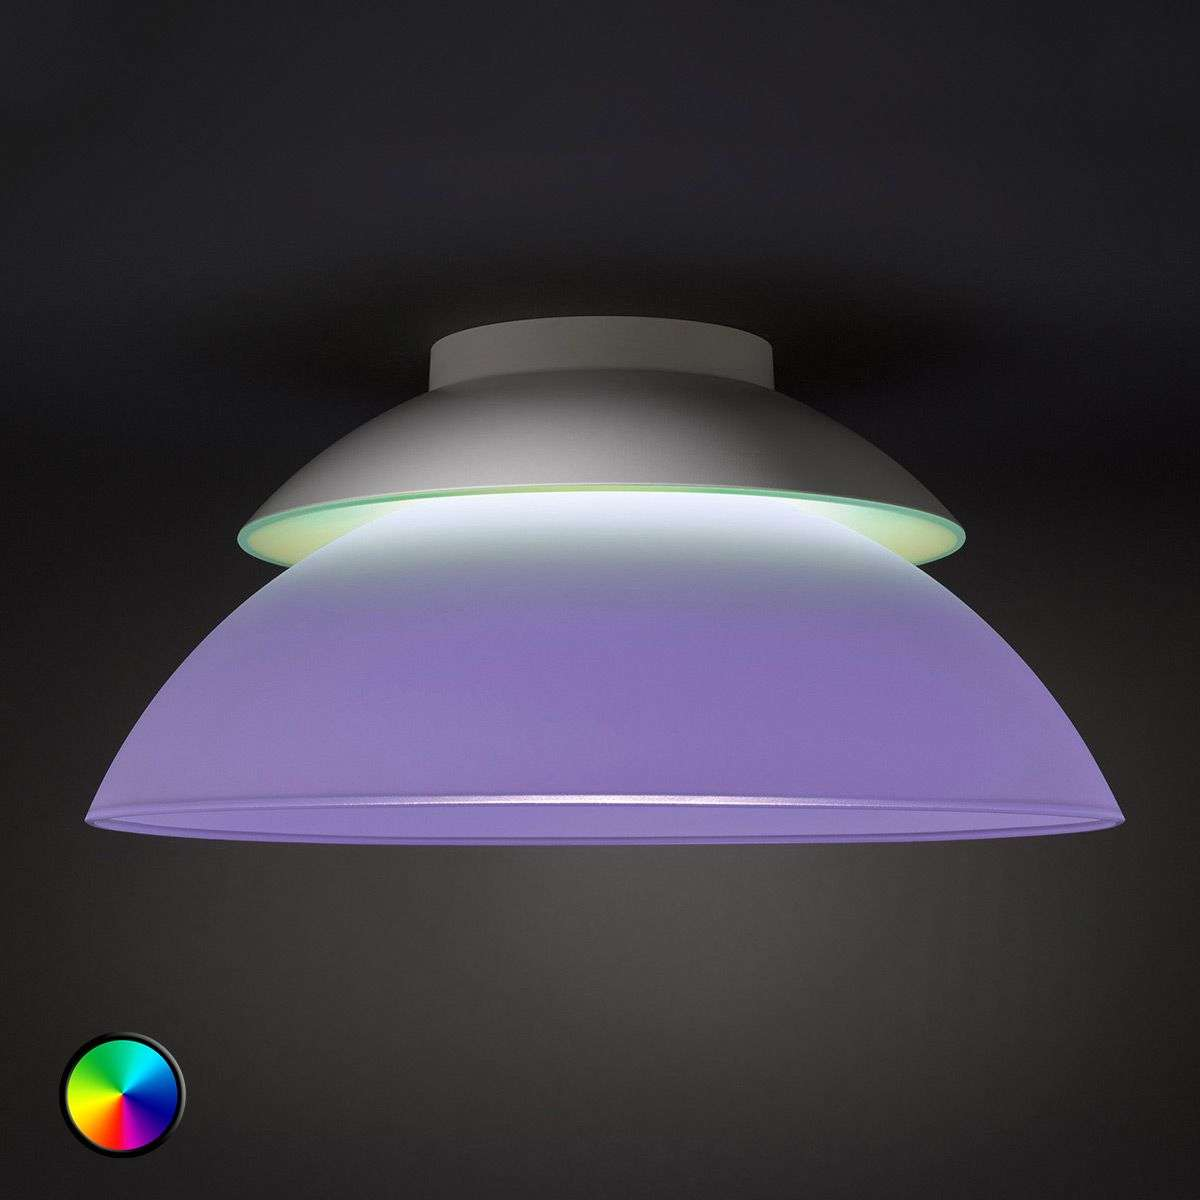 Philips hue beyond ceiling light lights philips hue beyond ceiling light 7531596 31 mozeypictures Choice Image